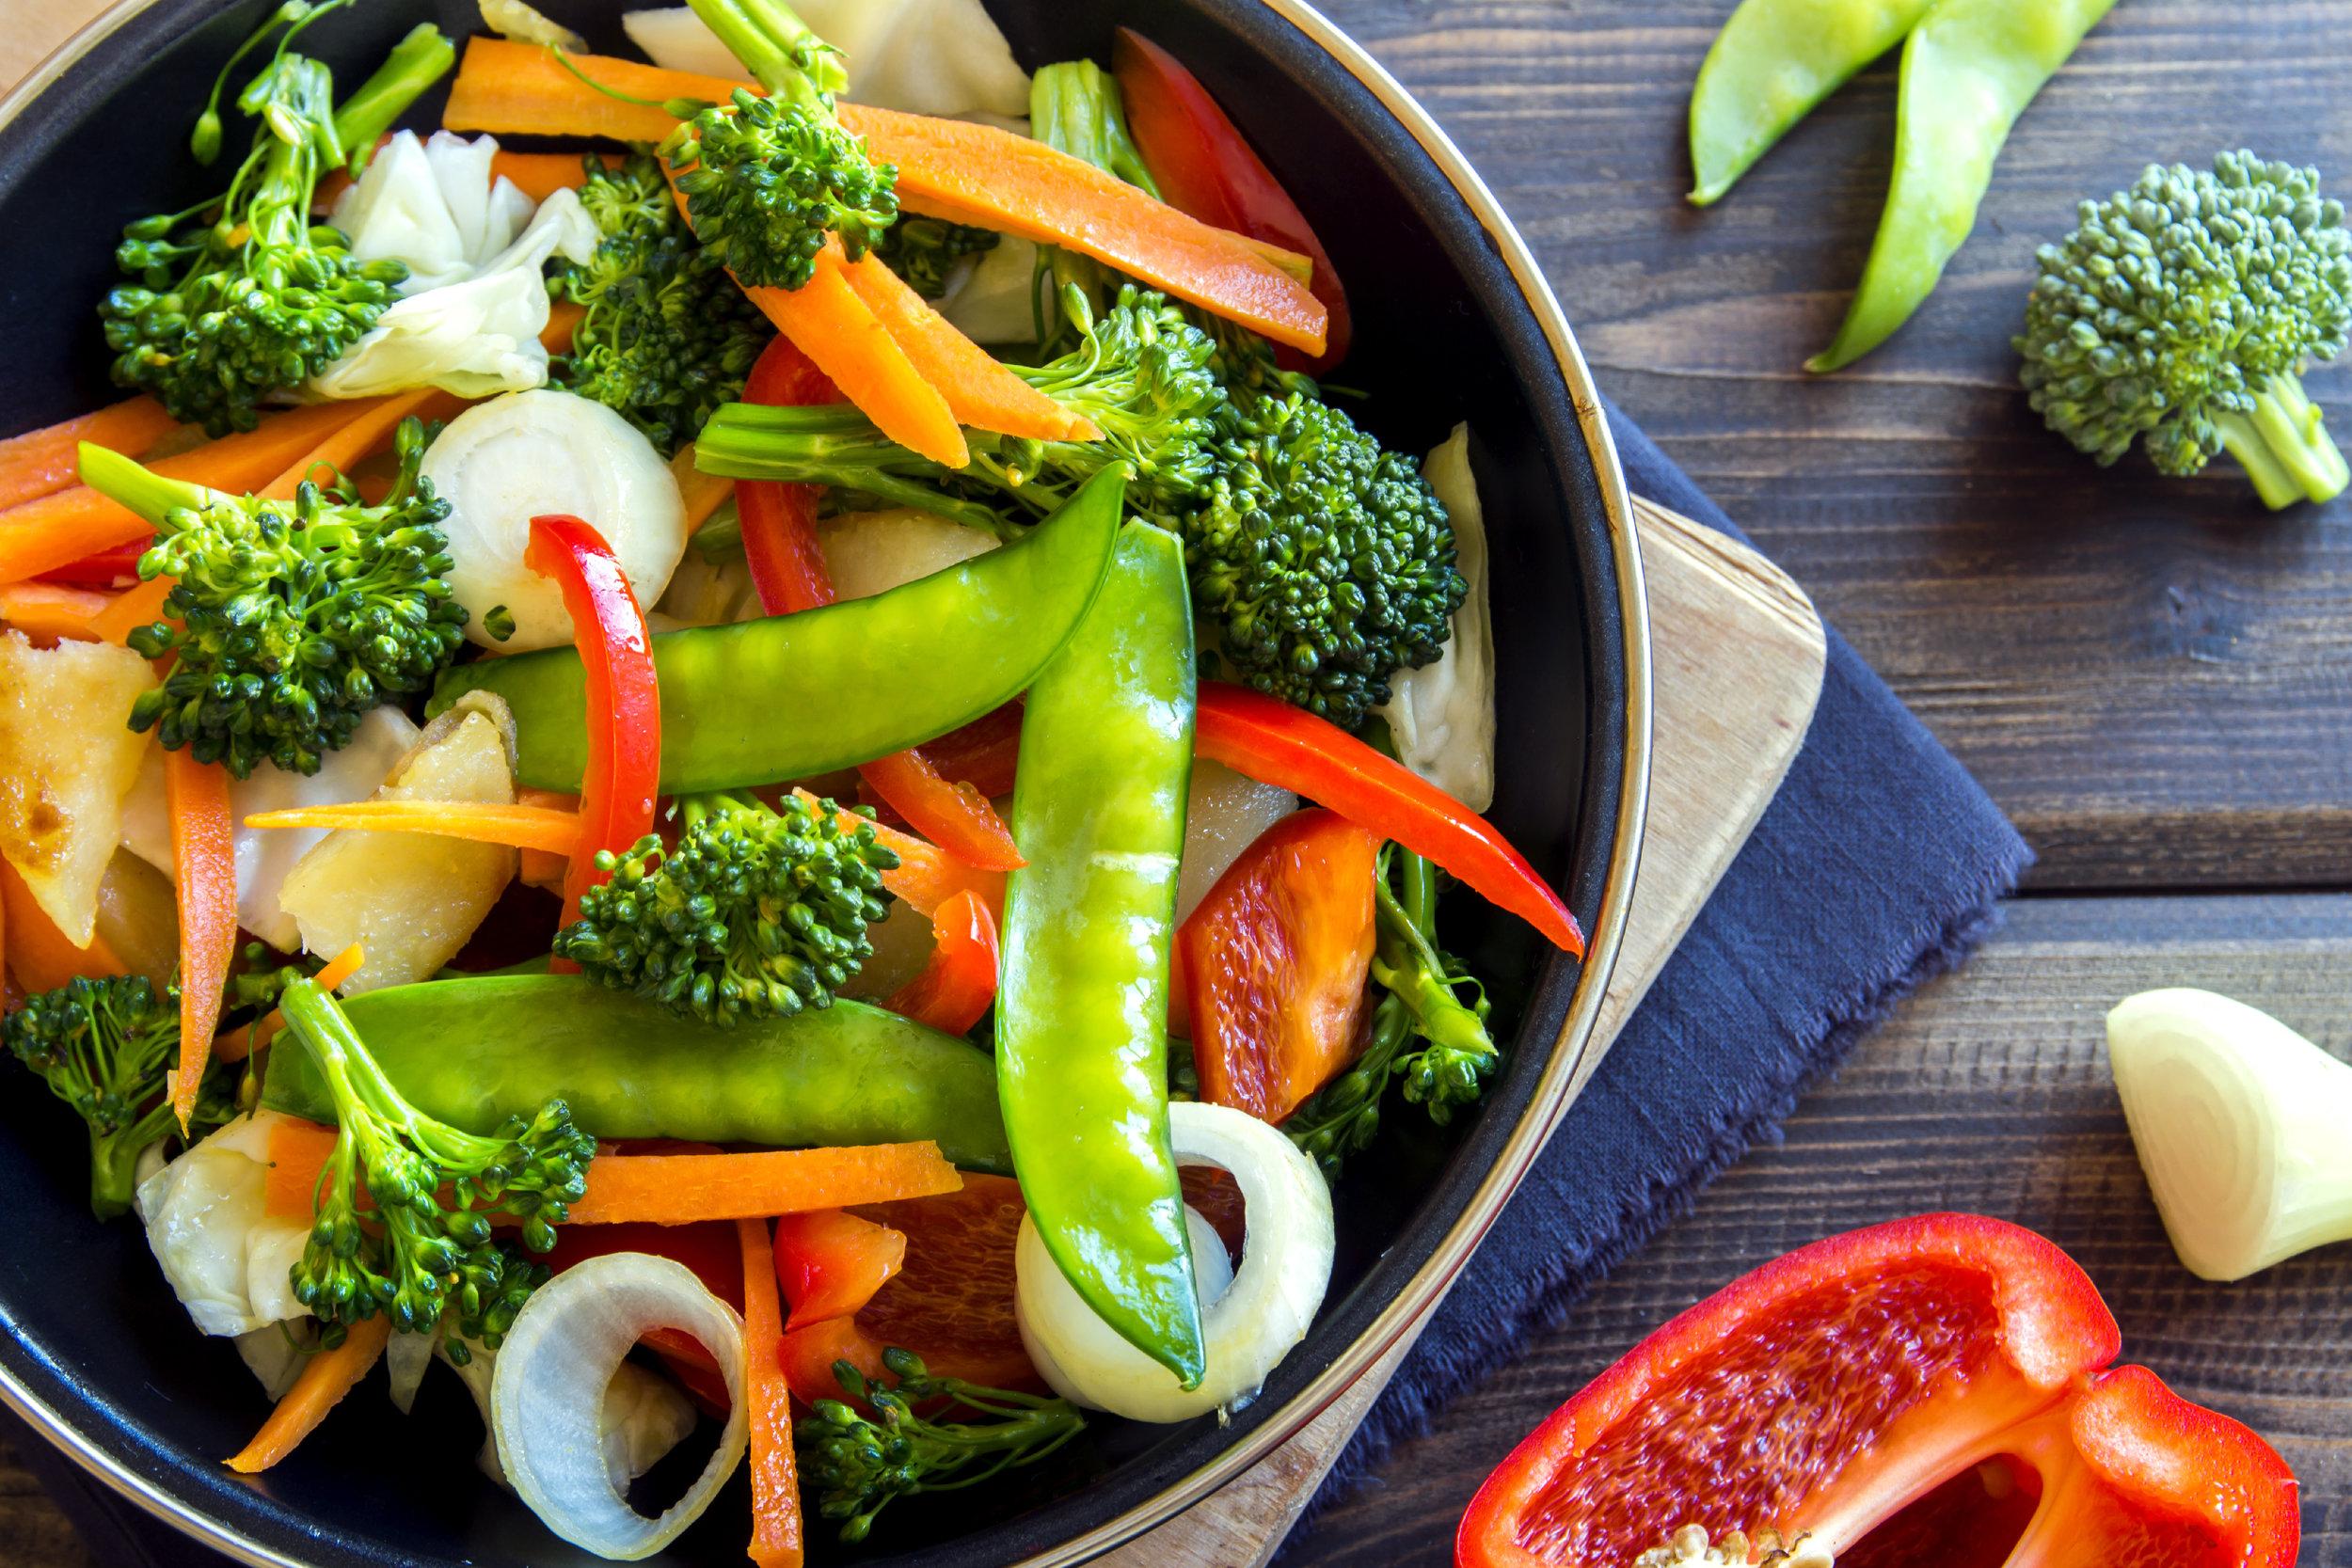 iStock-Stir fried vegetables 584747904.jpg